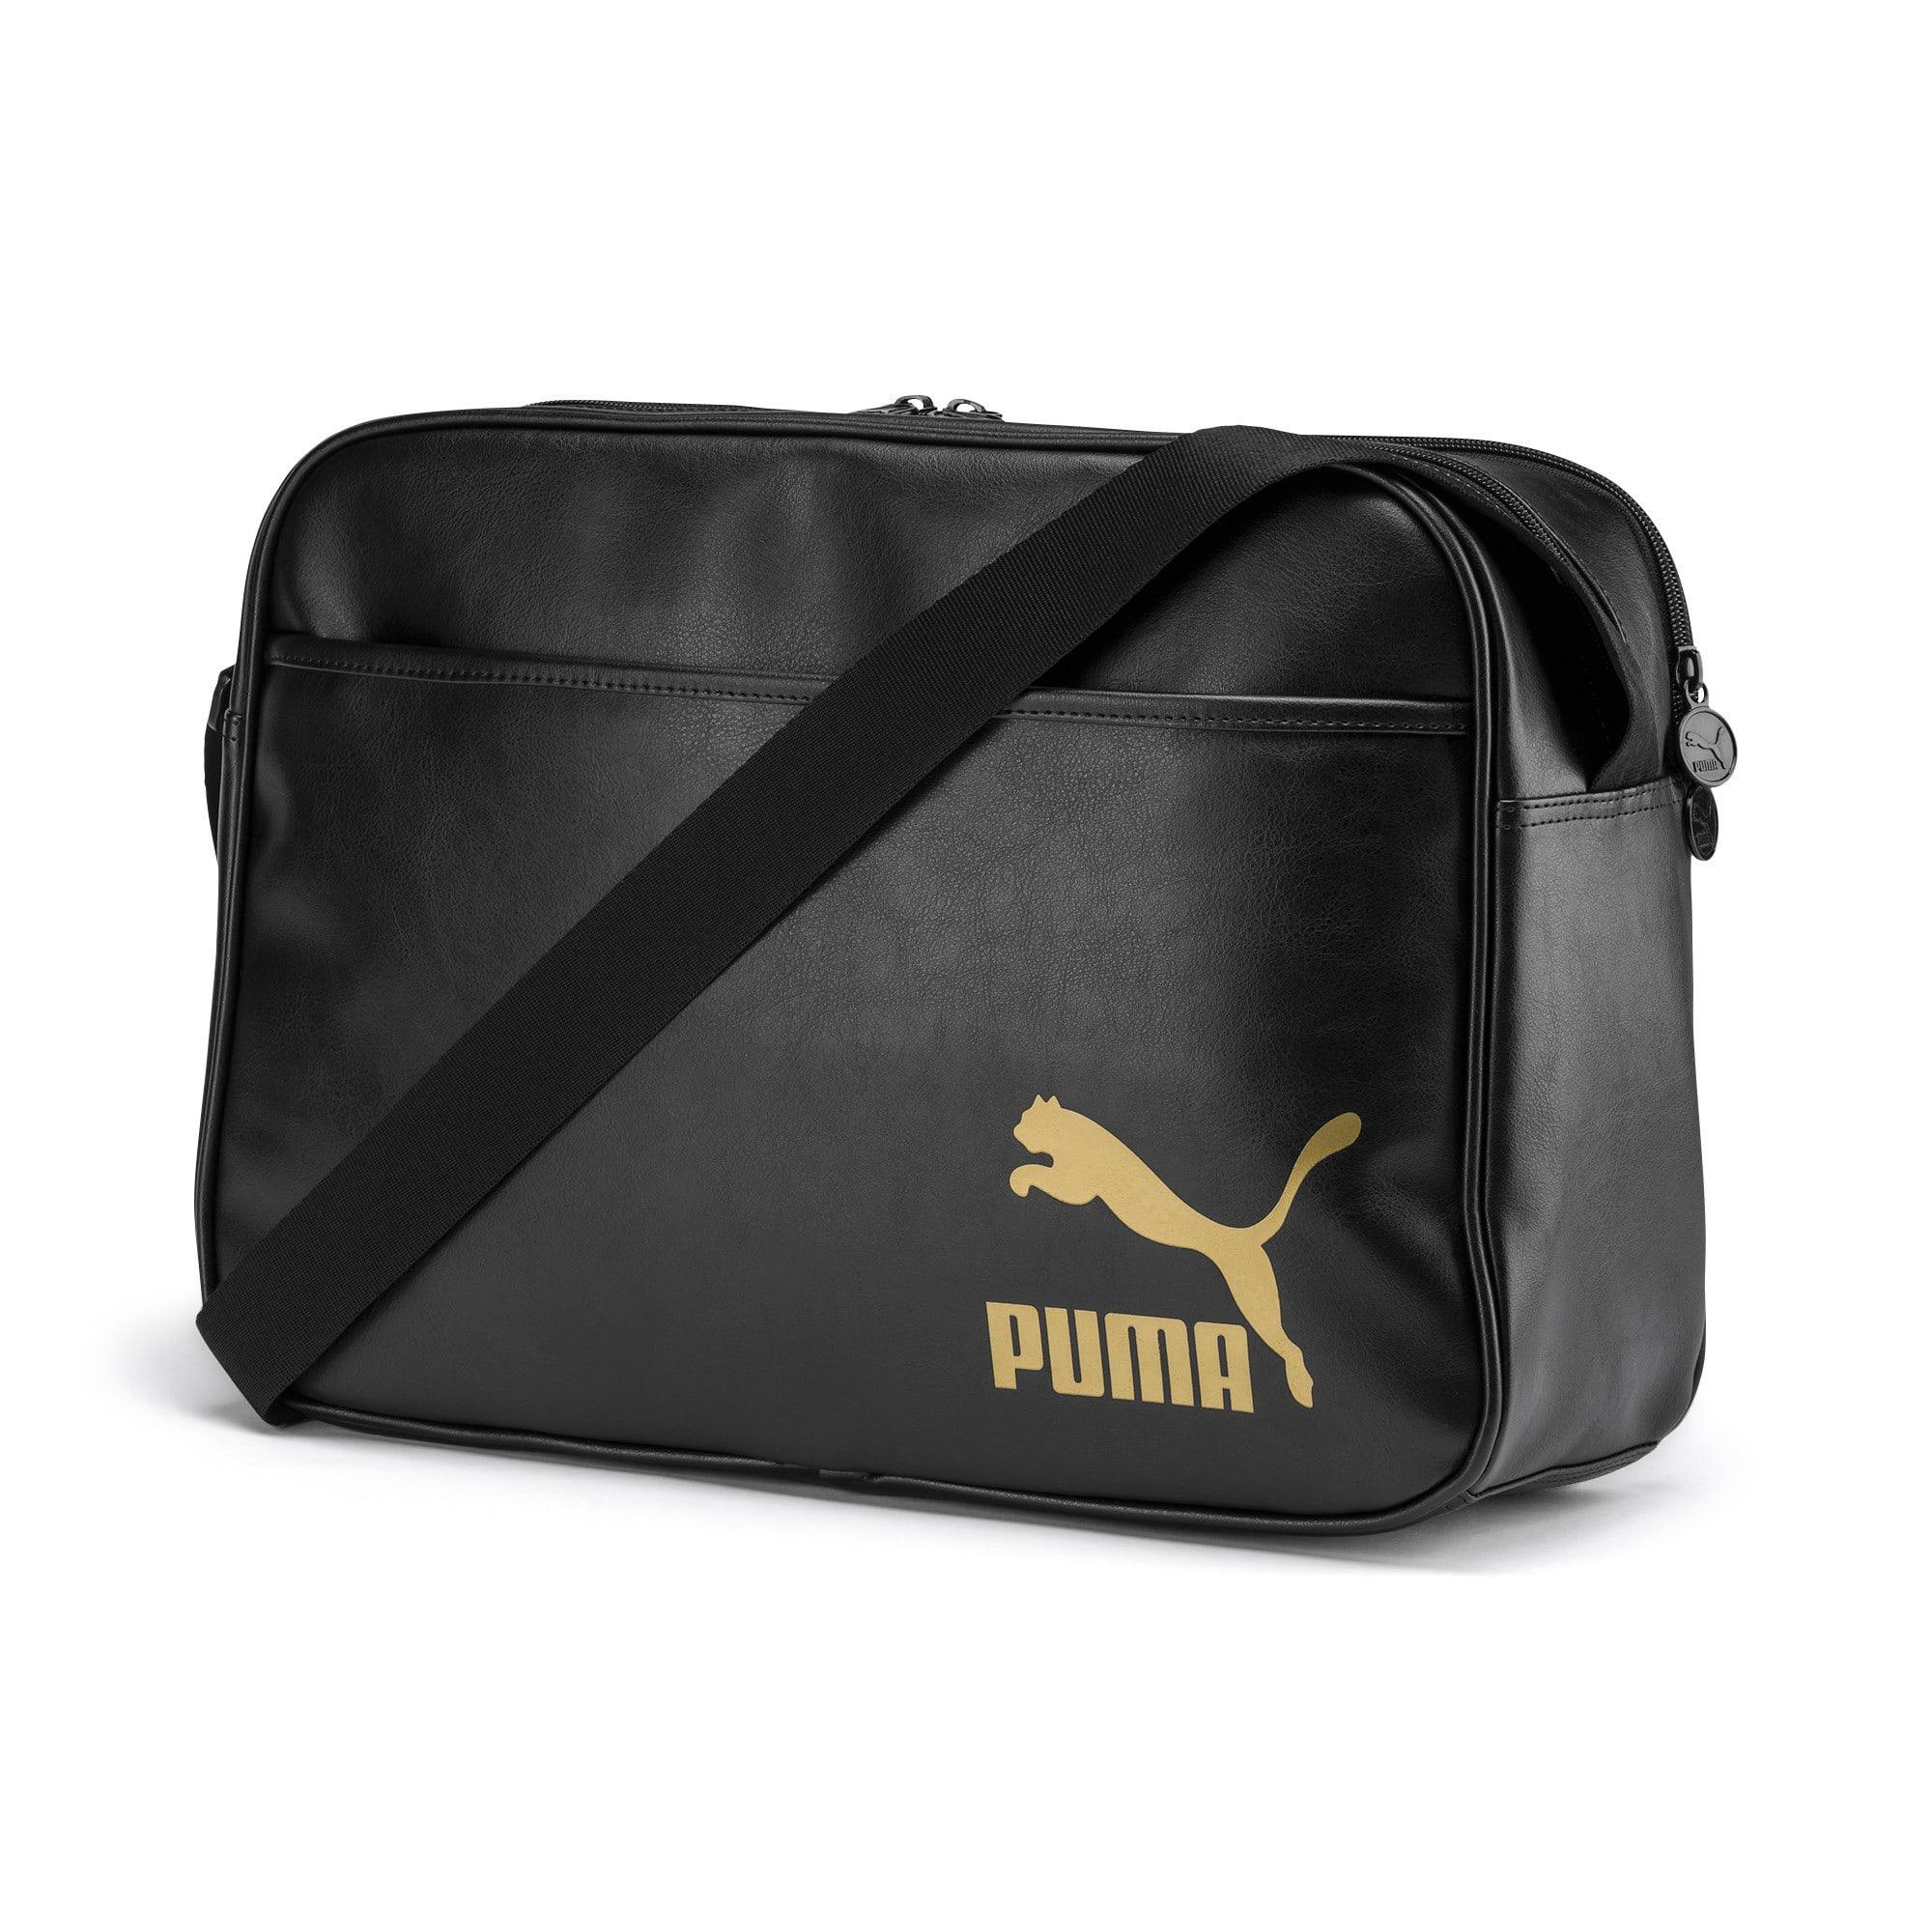 Thumbnail 1 of Originals Retro Reporter Bag, Puma Black, medium